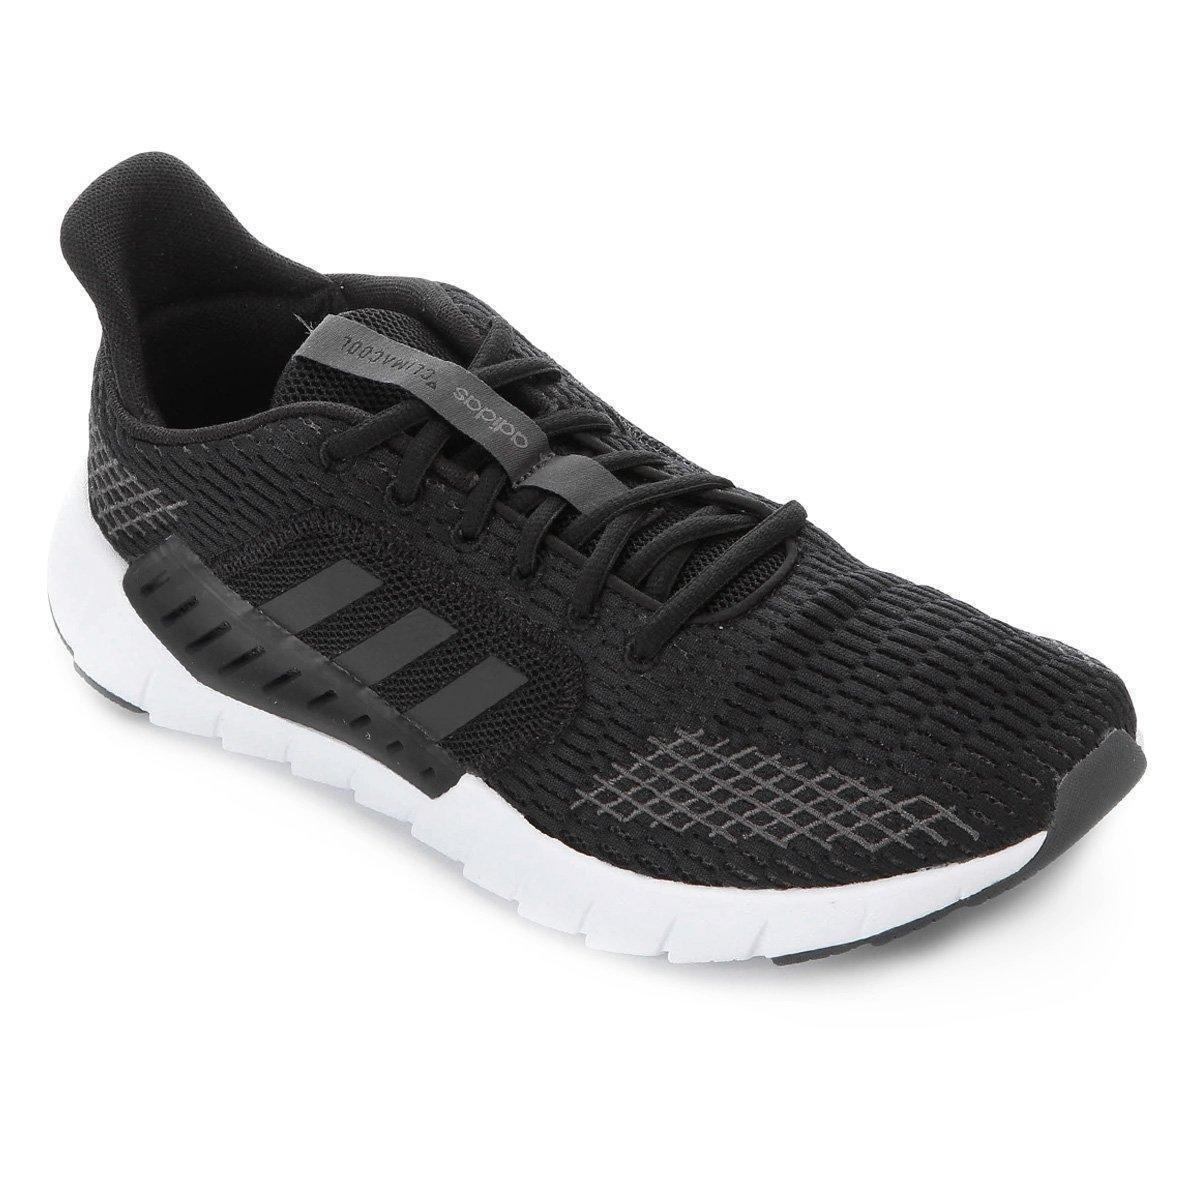 59fd33226bc75 FornecedorNetshoes. Tênis Adidas Ozweego Climacool Masculino